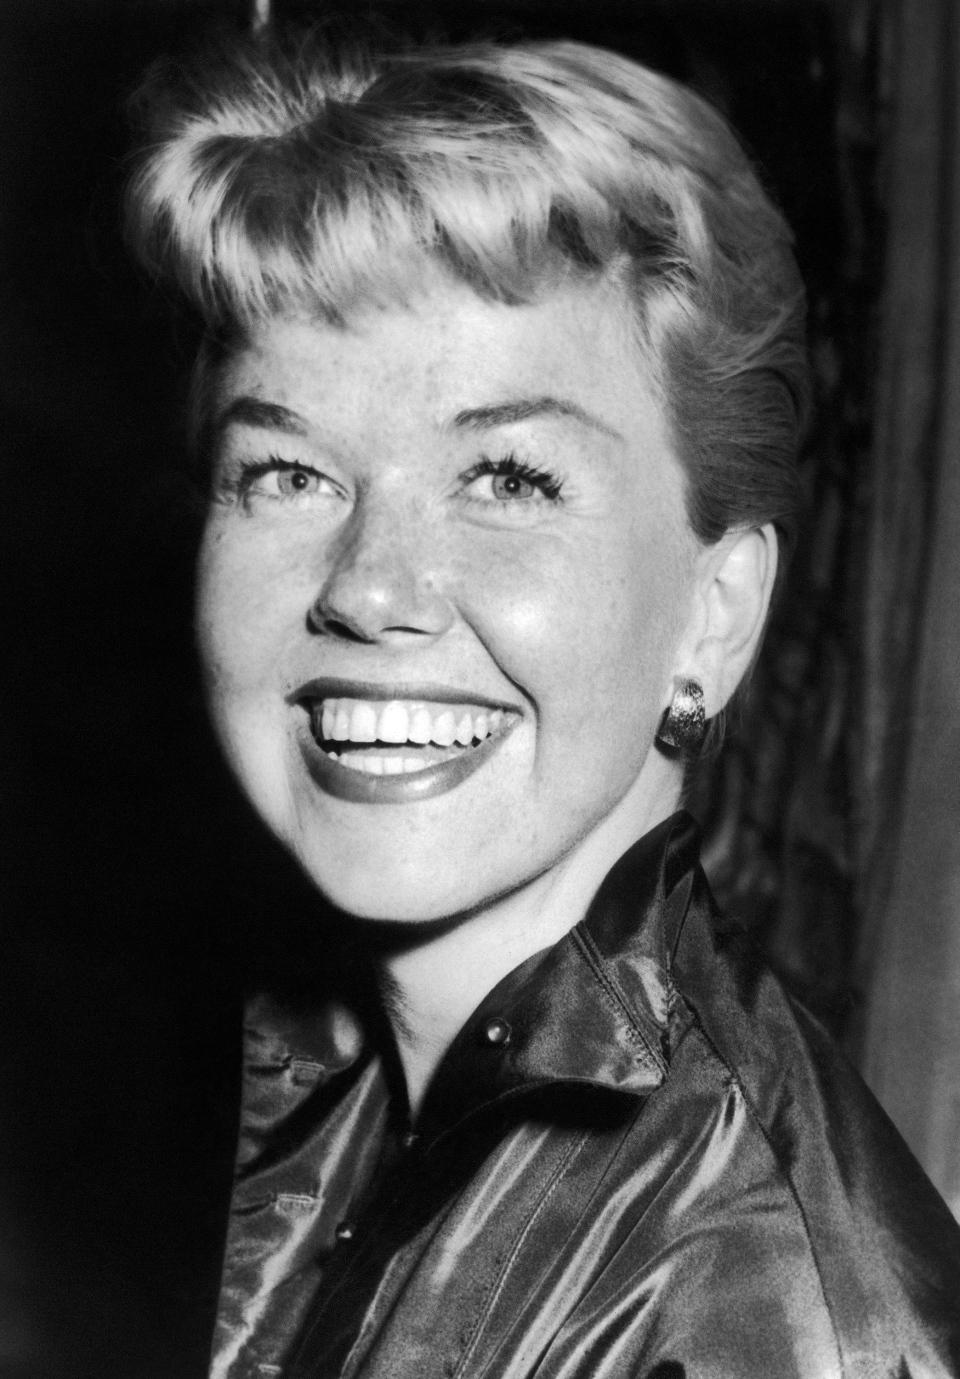 Film actress and singer Doris Day smiles in London, April 12, 1955. (AP Photo/Bob Dear)